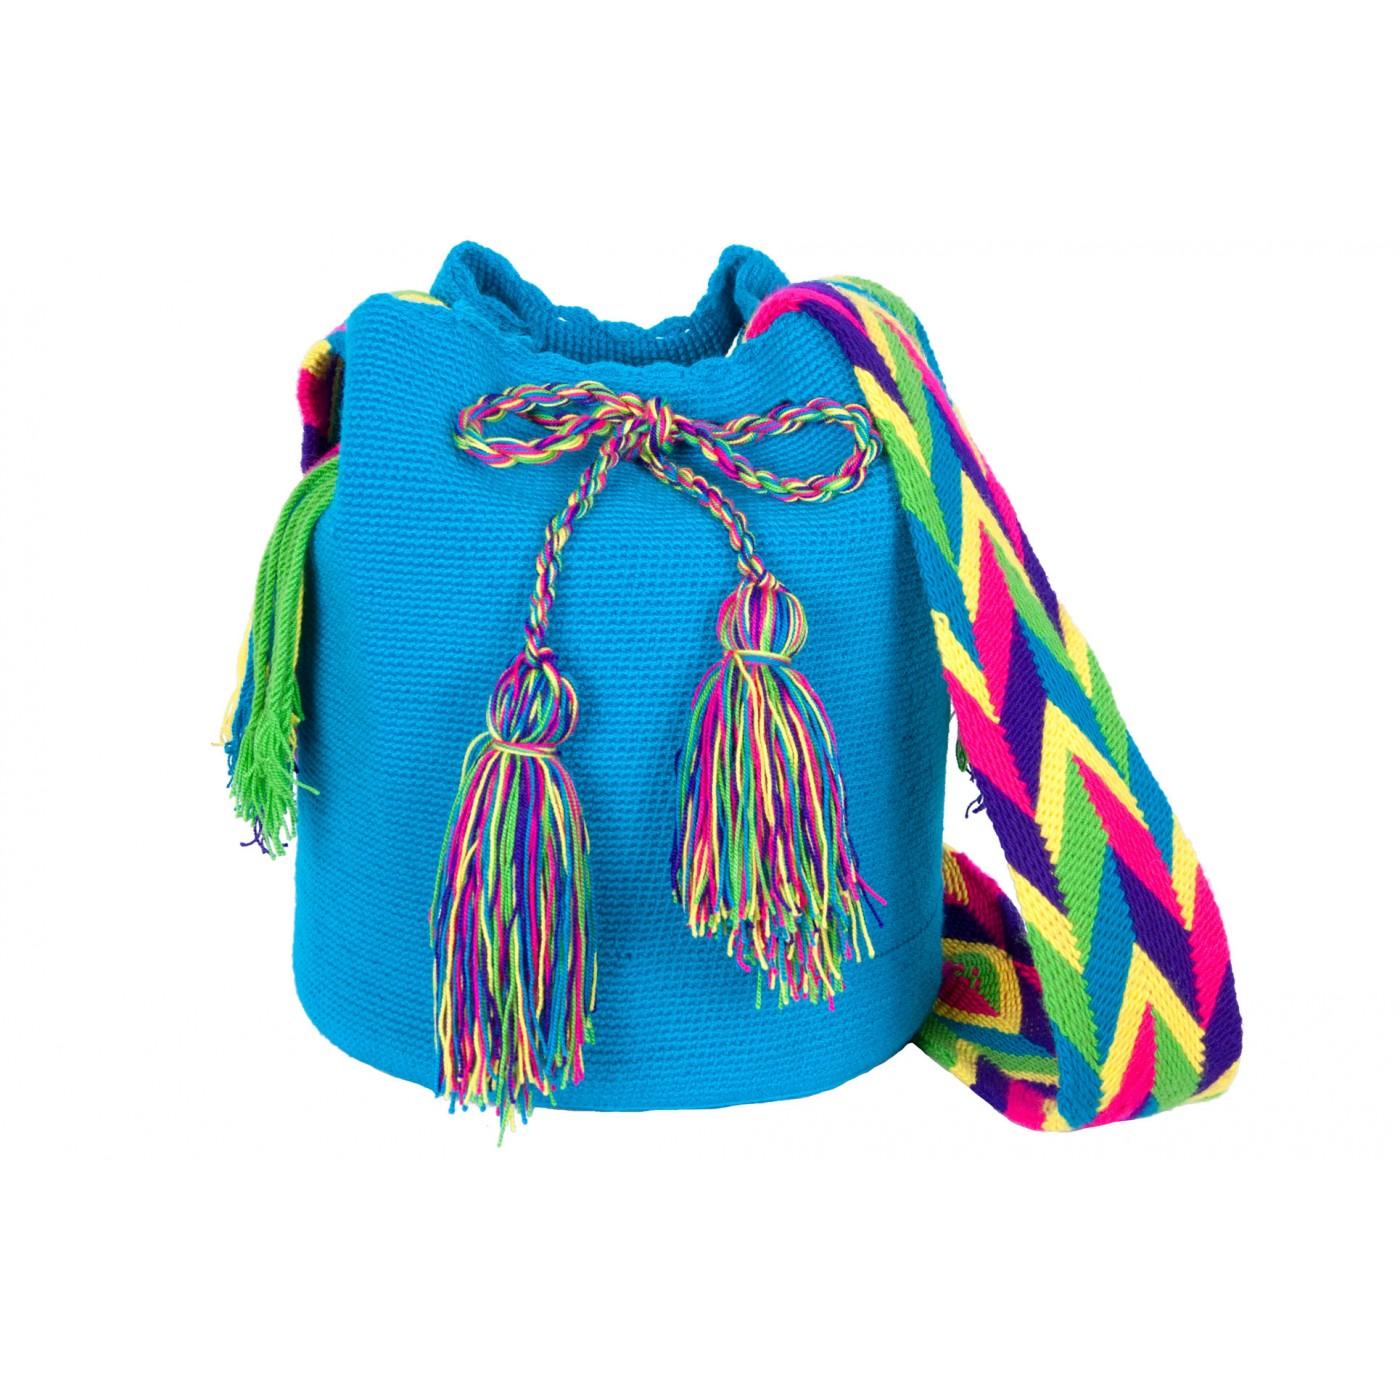 Colombien Mochila Artisanal Wayuu Bleu Sac Xwk8n0OP